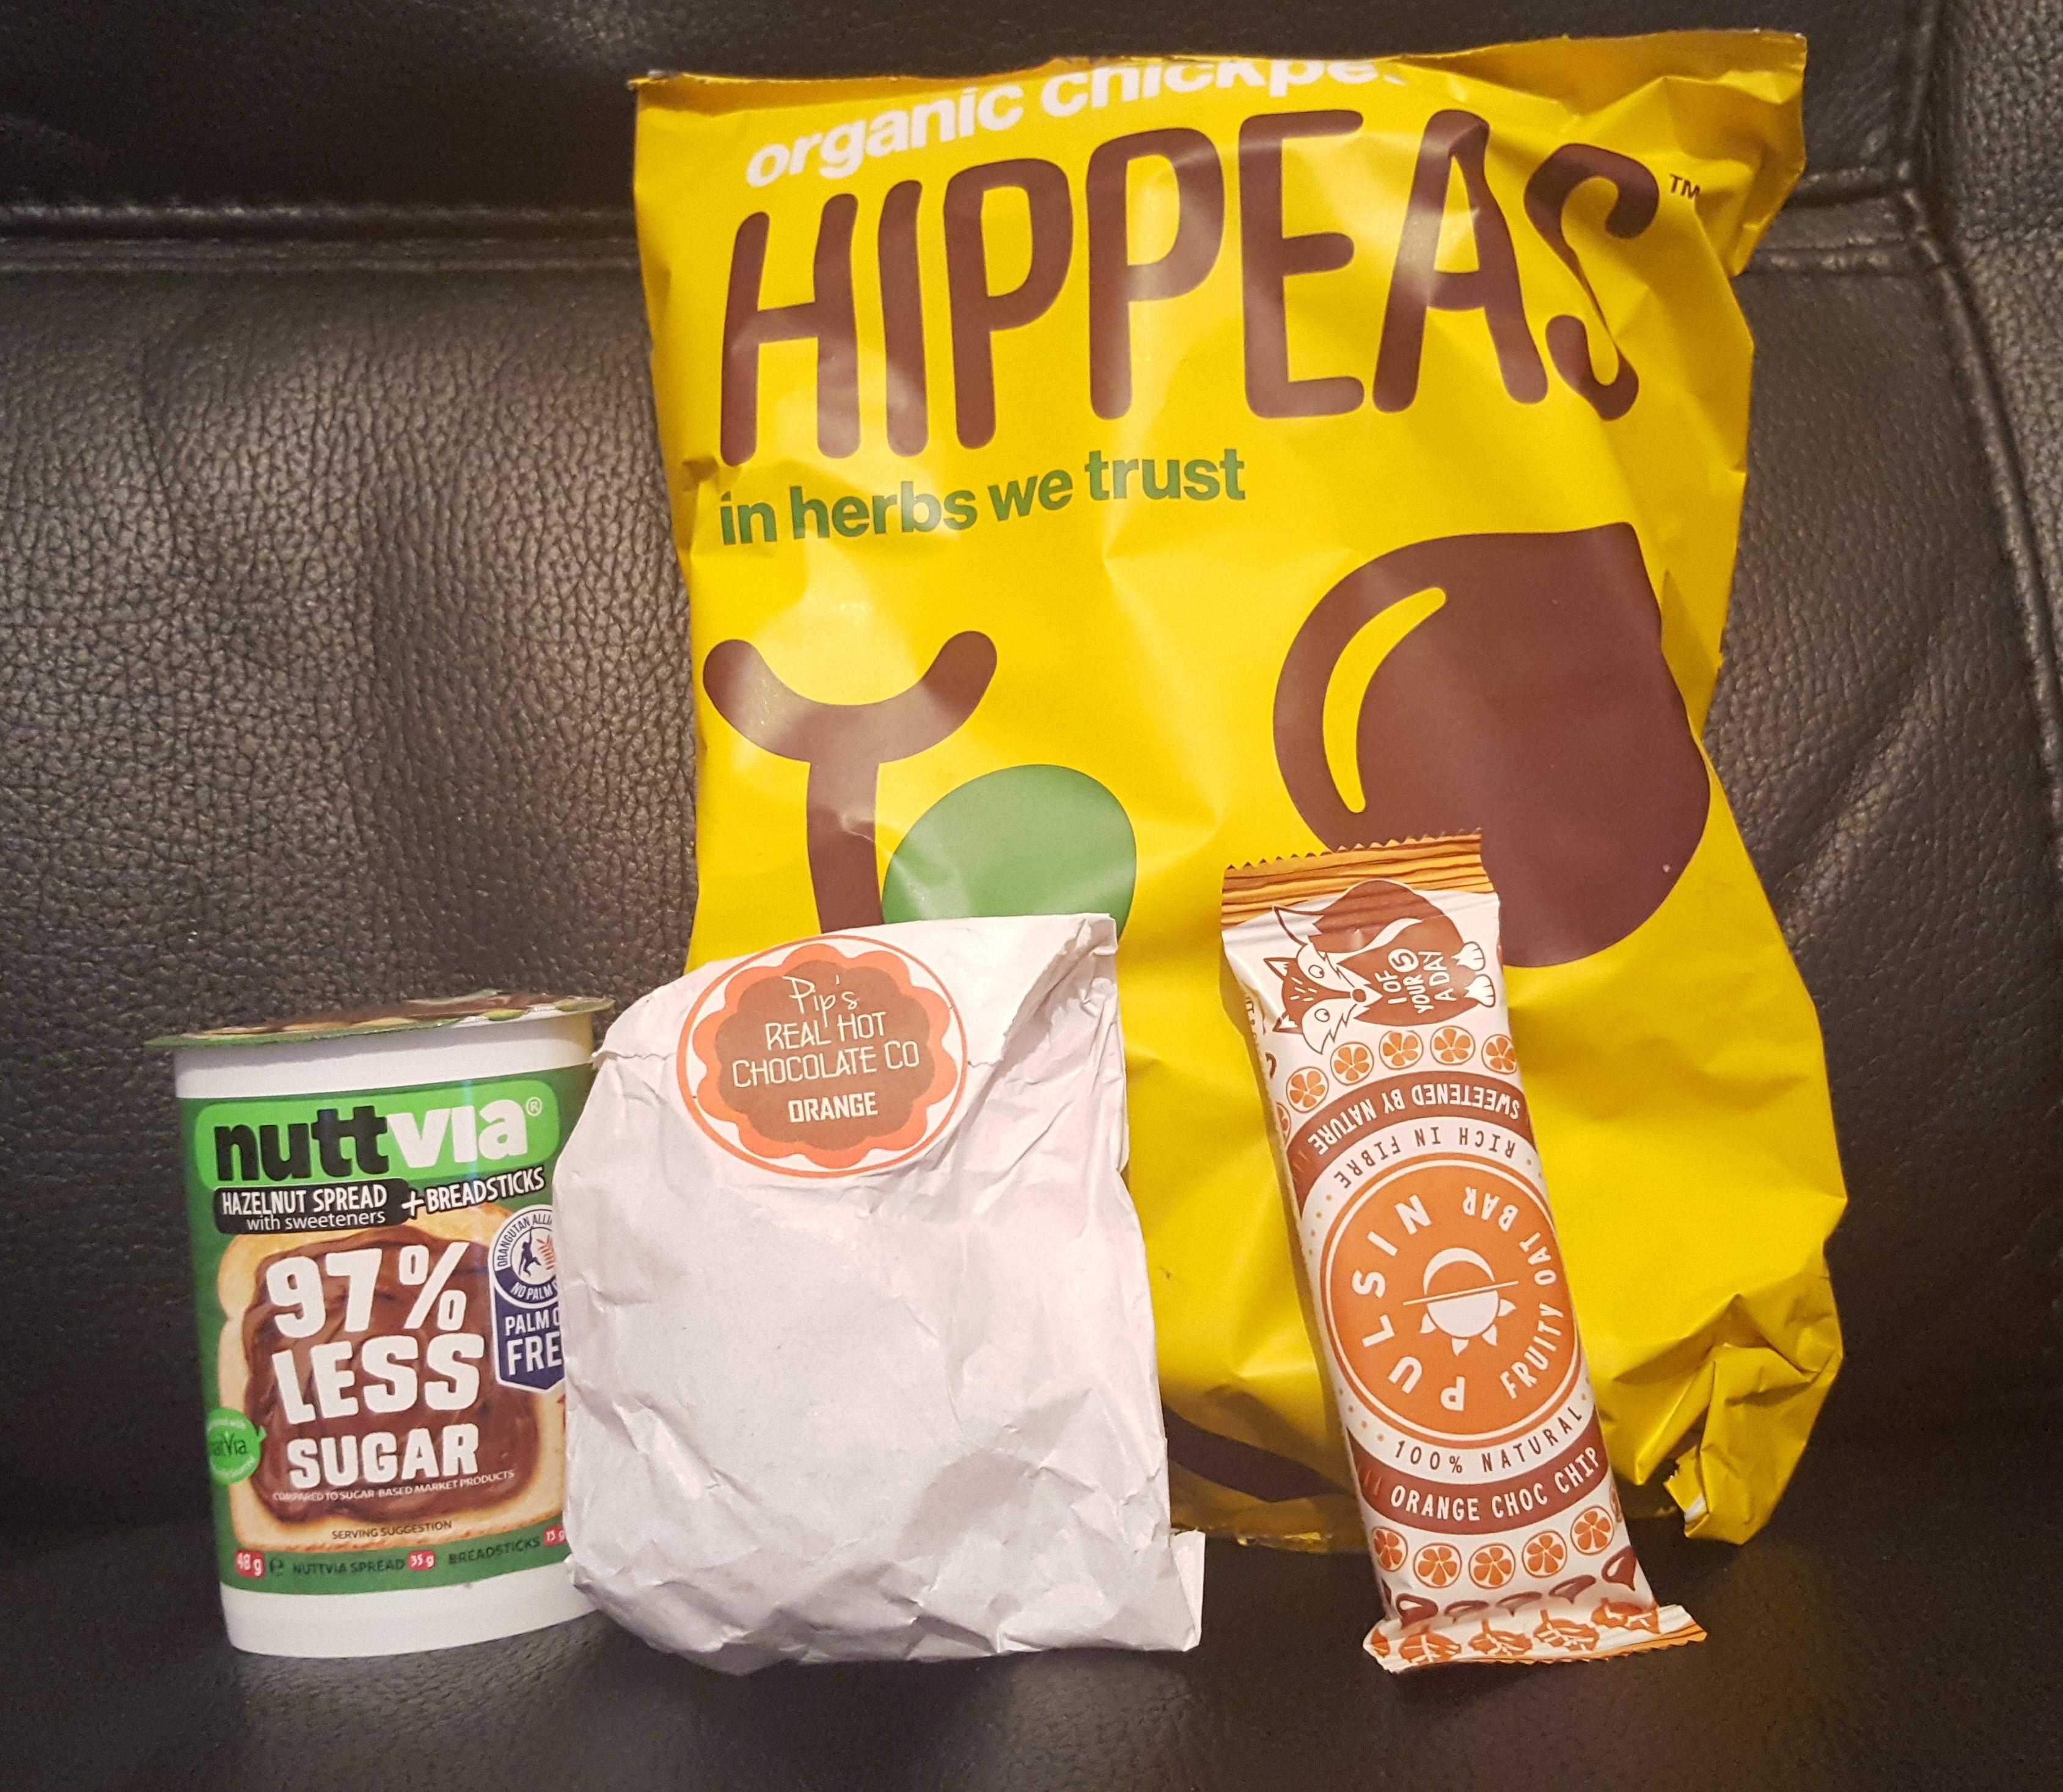 Degustabox - Nuttvia Breadsticks Snackpack - Pip's Real Hot Chocolate Co Real Hot Chocolate Coins - Pulsin Kids' Fruity Oat Bars Orange Choc Chip - Hippeas Organic Chickpea Puffs